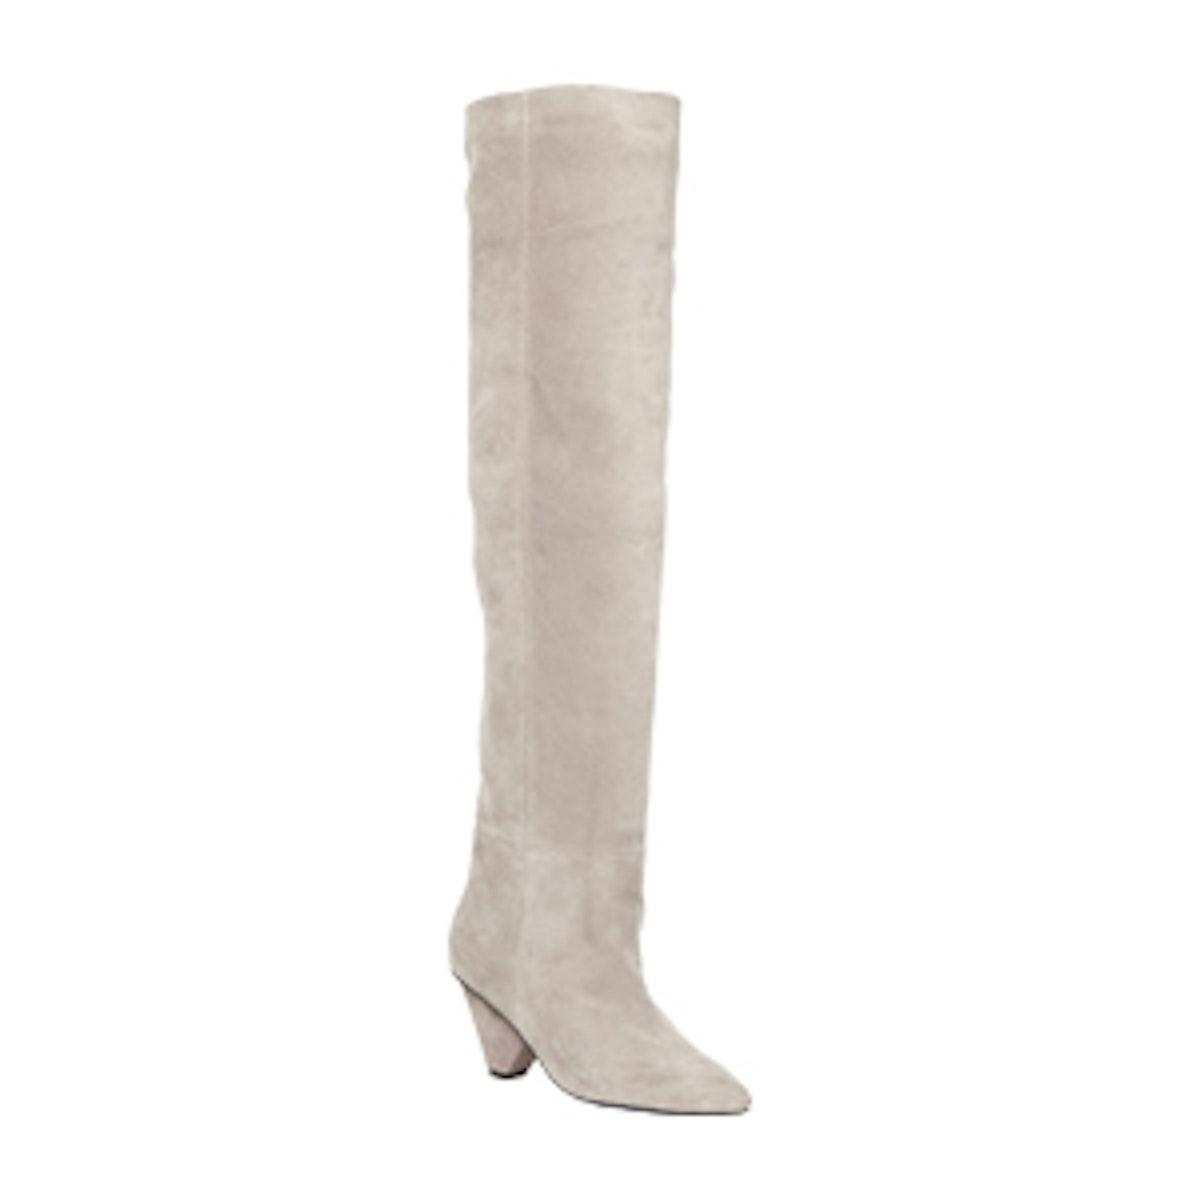 Senita Cone Heel Boots